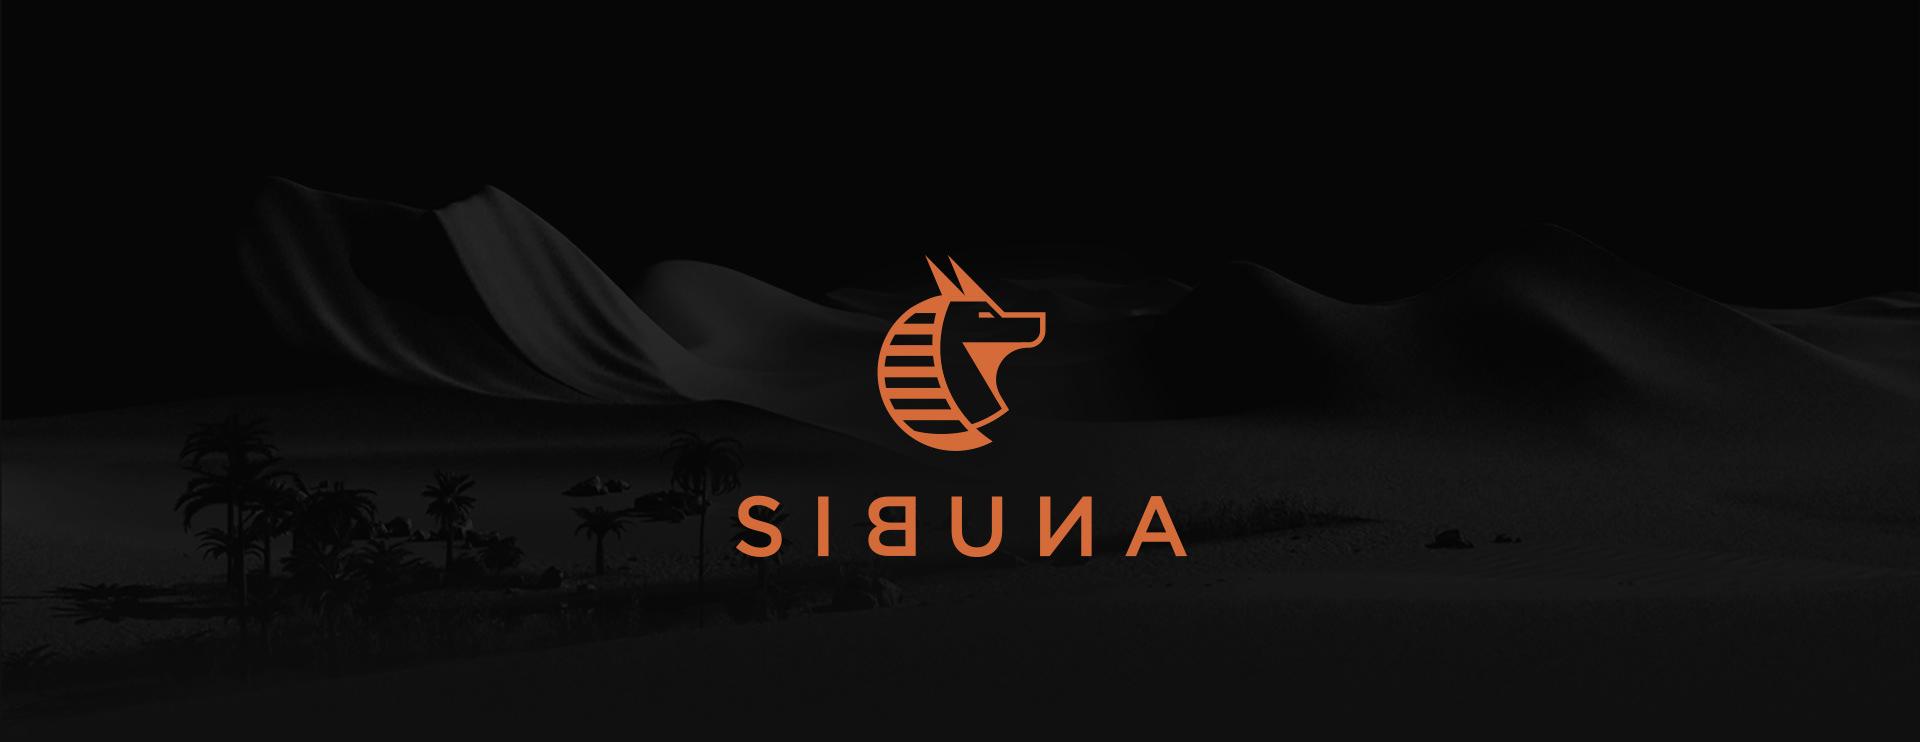 Luiz Arthuso Design Studio - Sibuna - Winery2.jpg